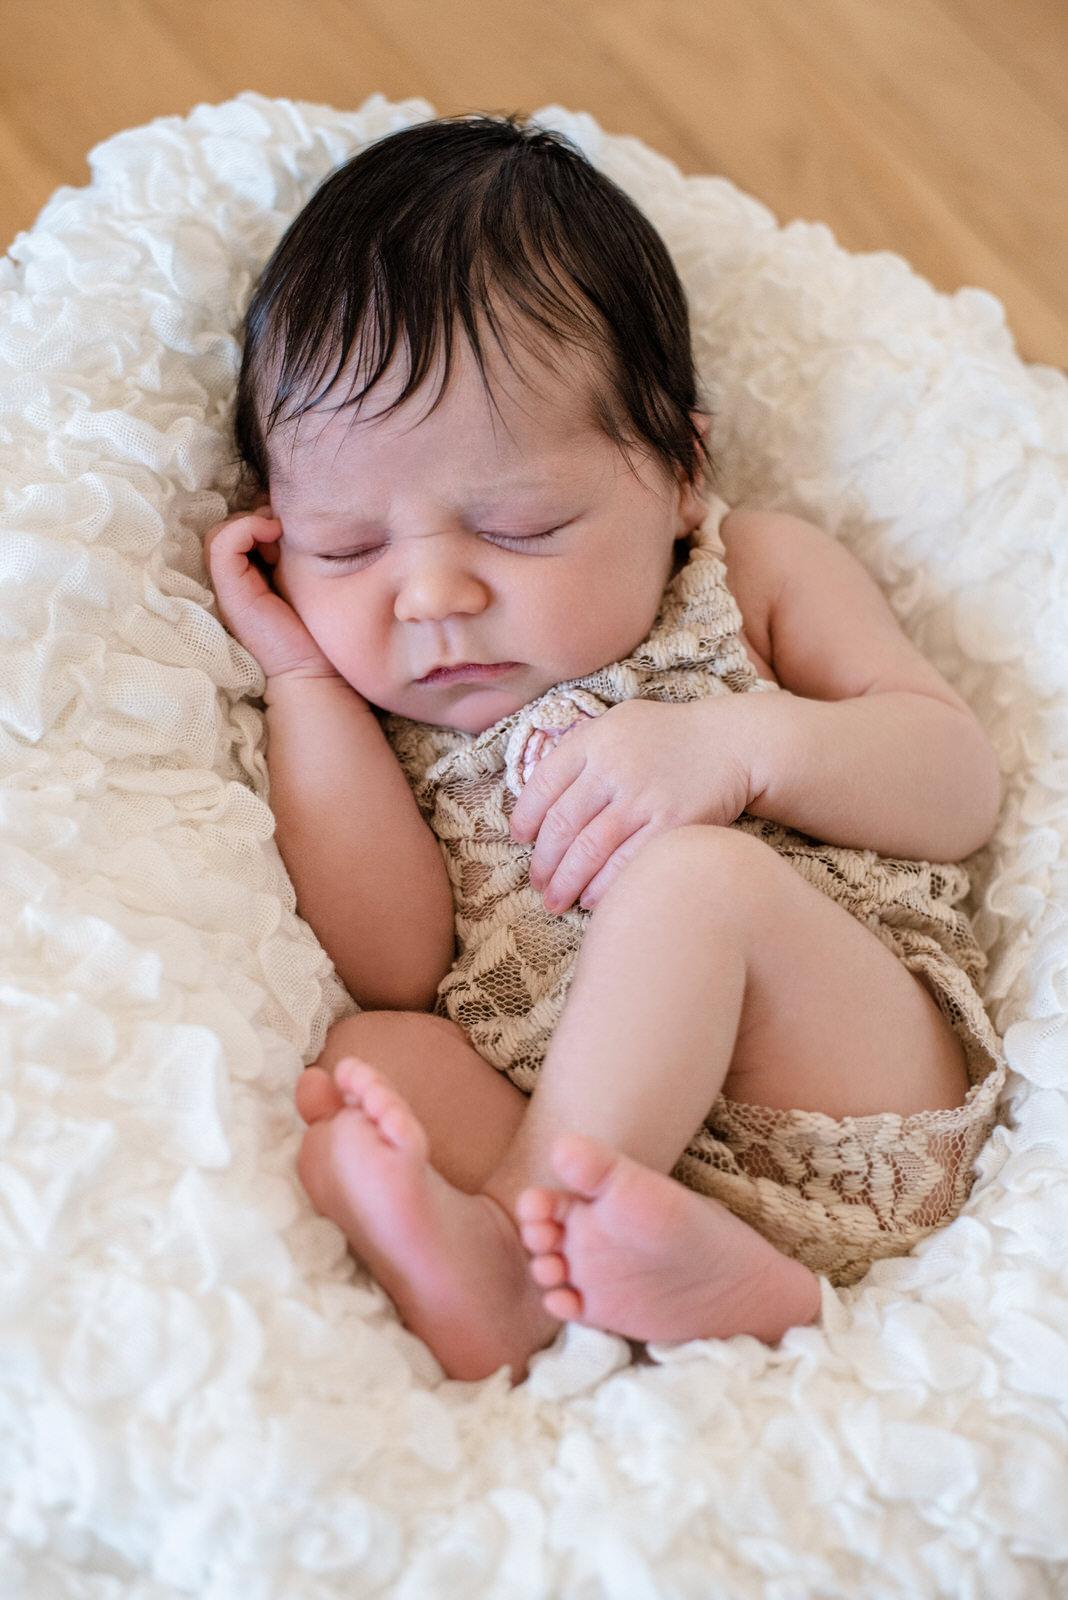 Babyfotos, Babyfotoshooting, Baby Fotoshooting in Leipzig, Markkleeberg und Halle